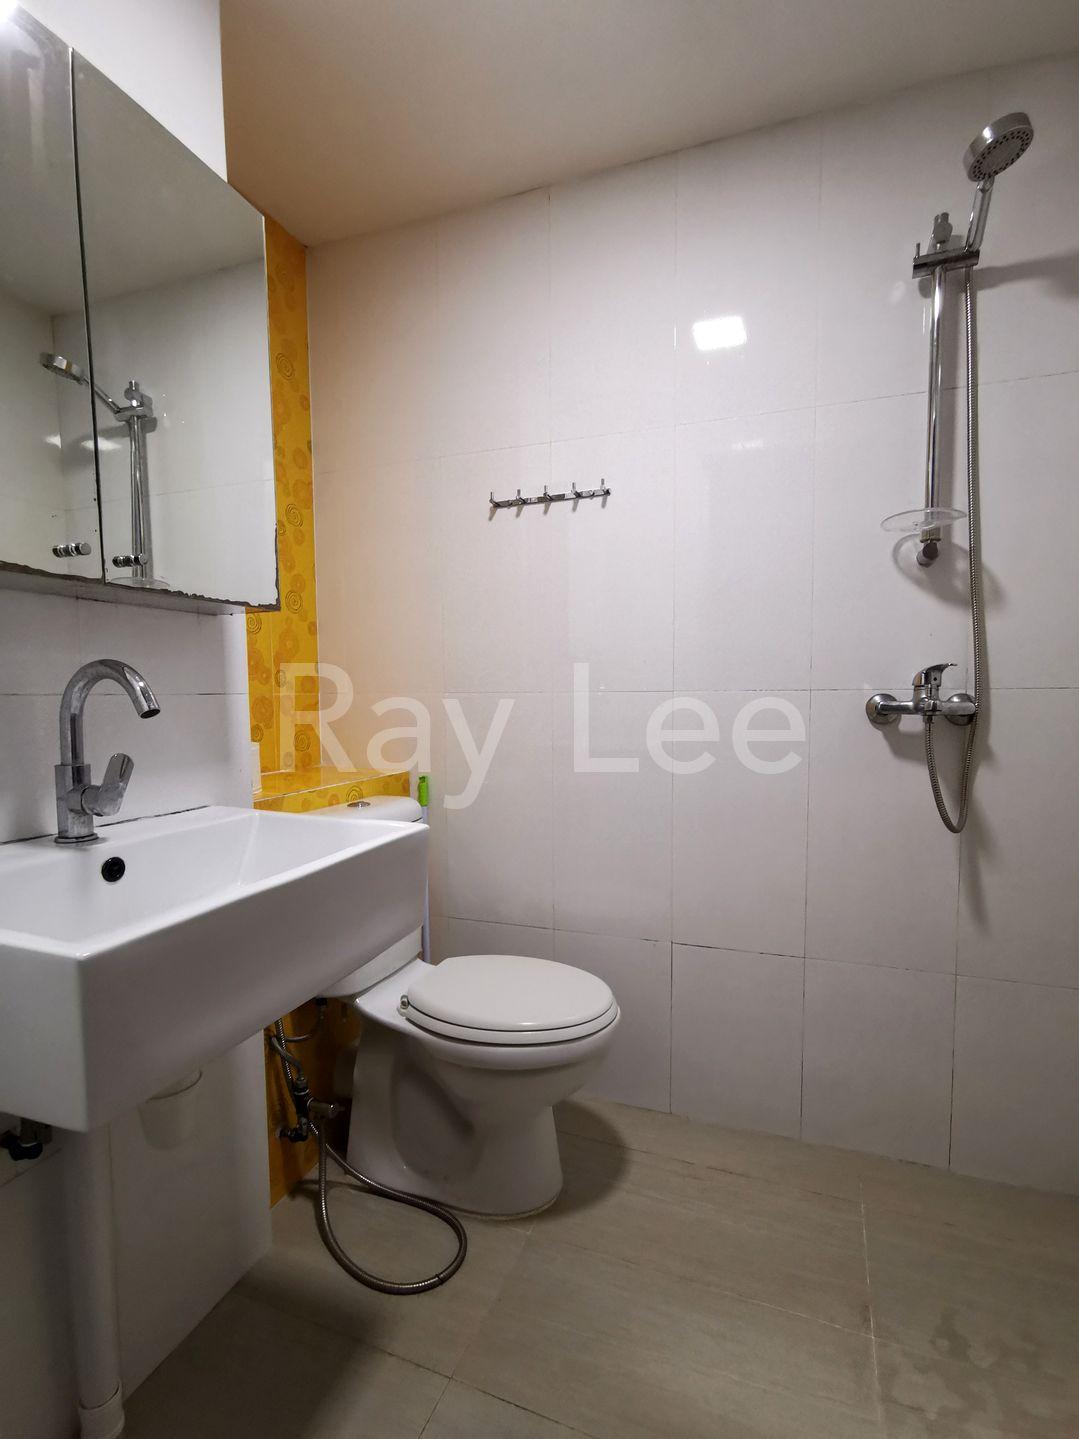 People's Park Centre - Commo Bathroom